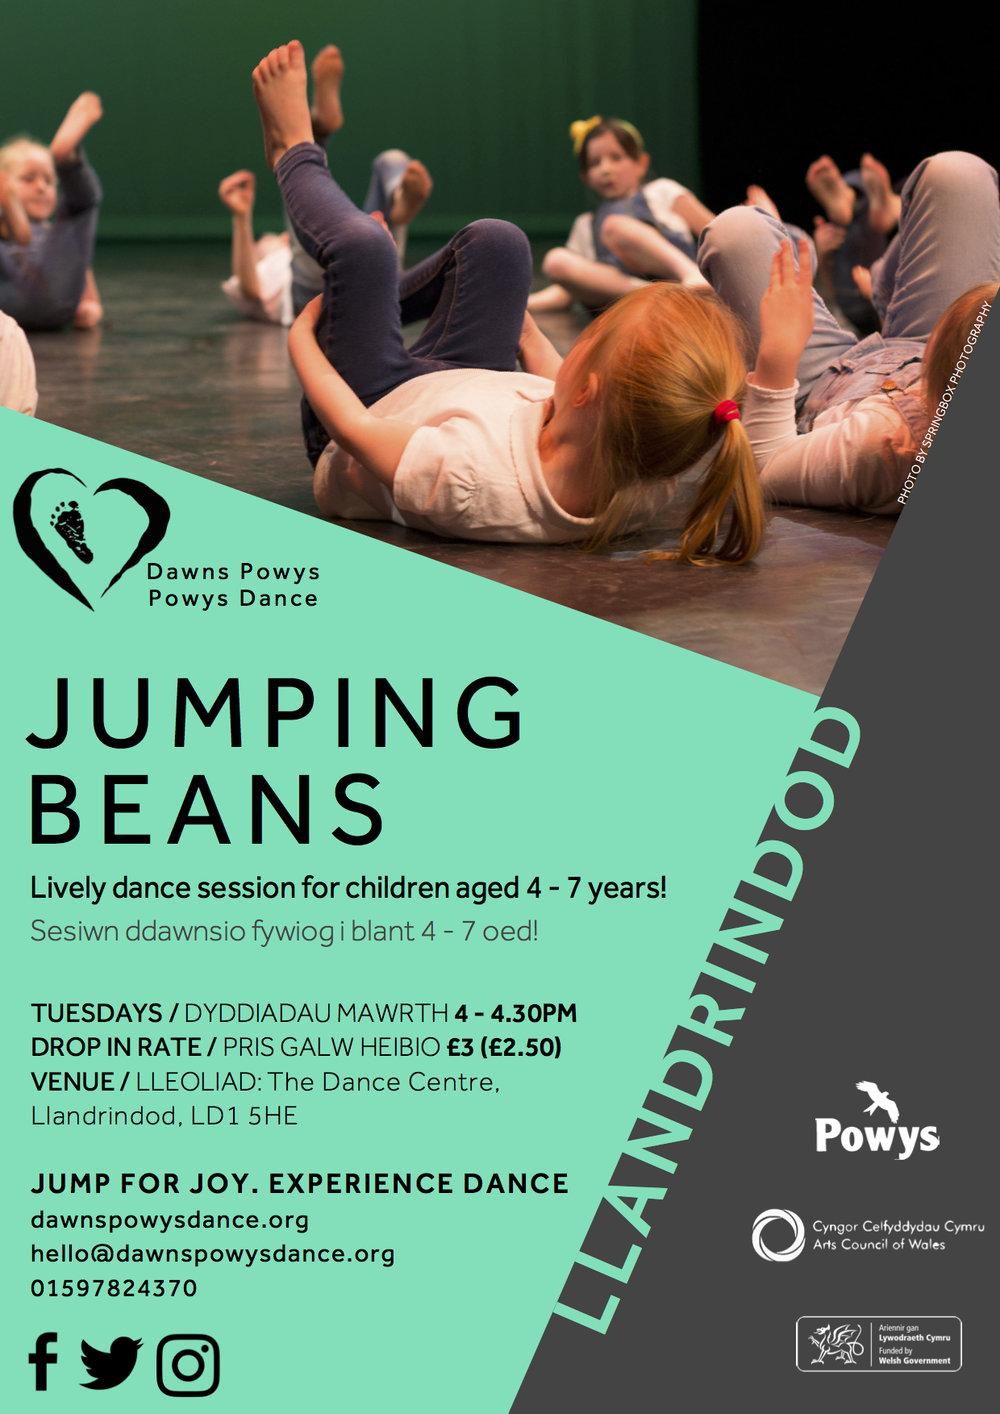 jumping beans 2018.jpg